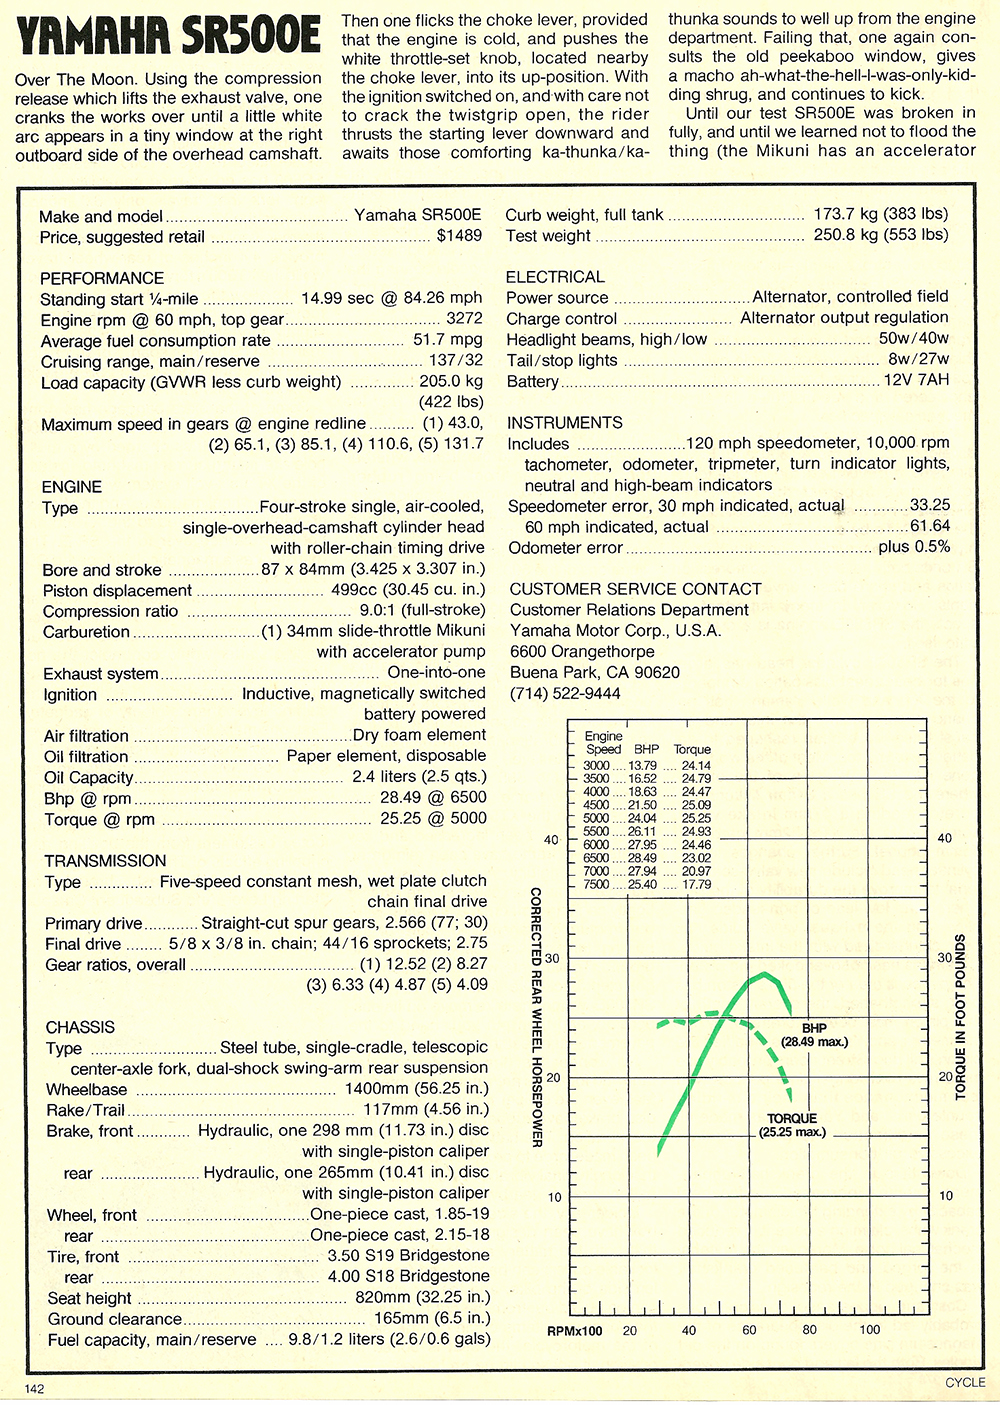 1978 Yamaha SR500E road test 4.jpg